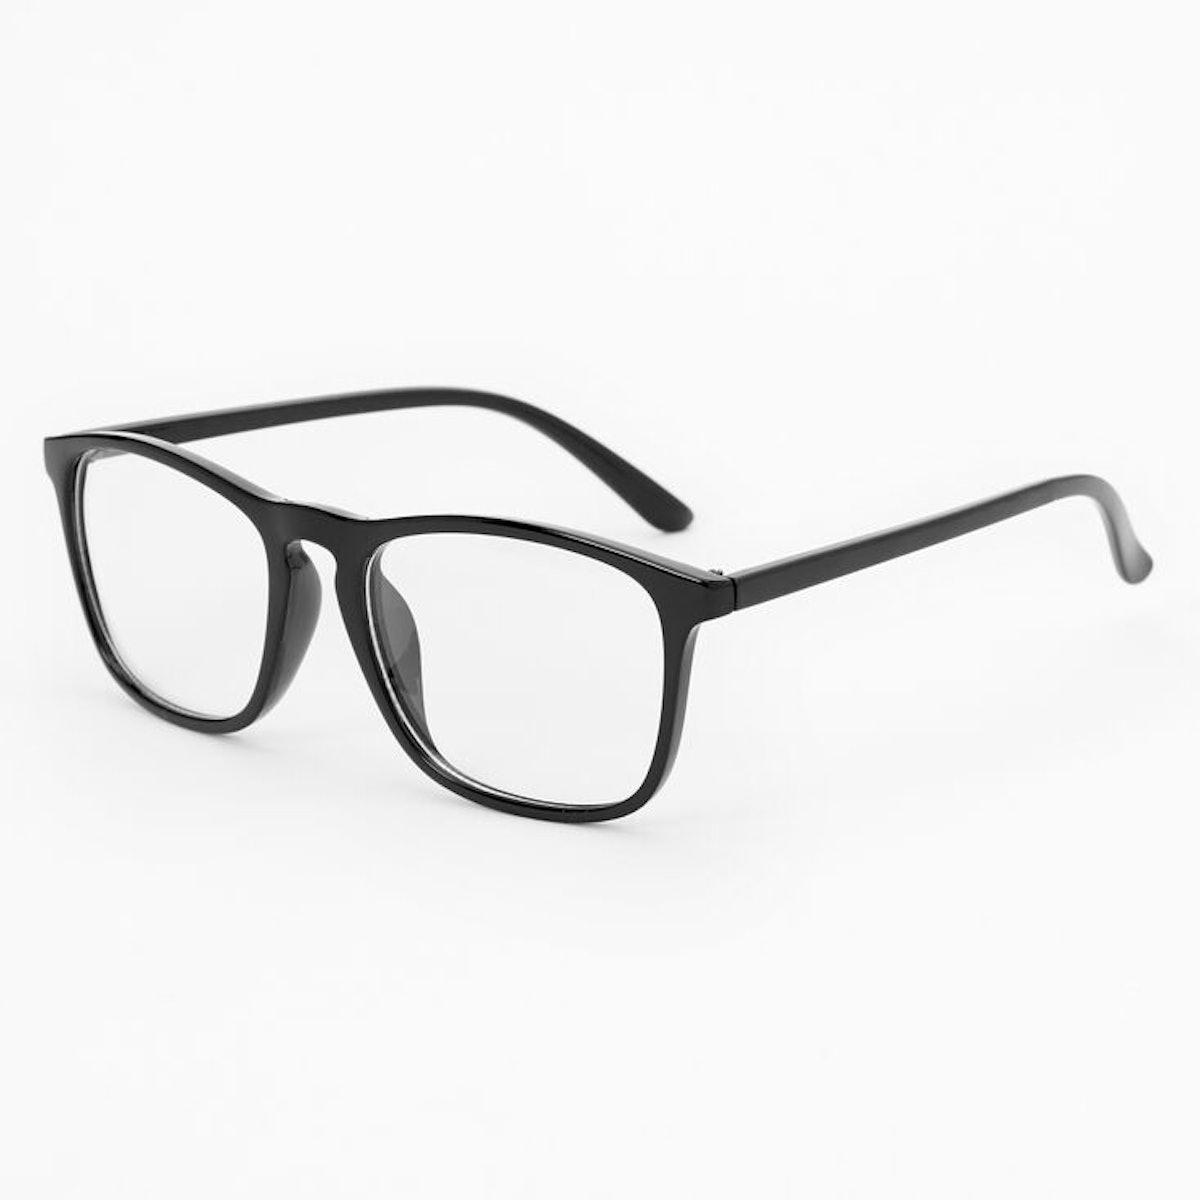 Solid Black Retro Clear Glass Frames